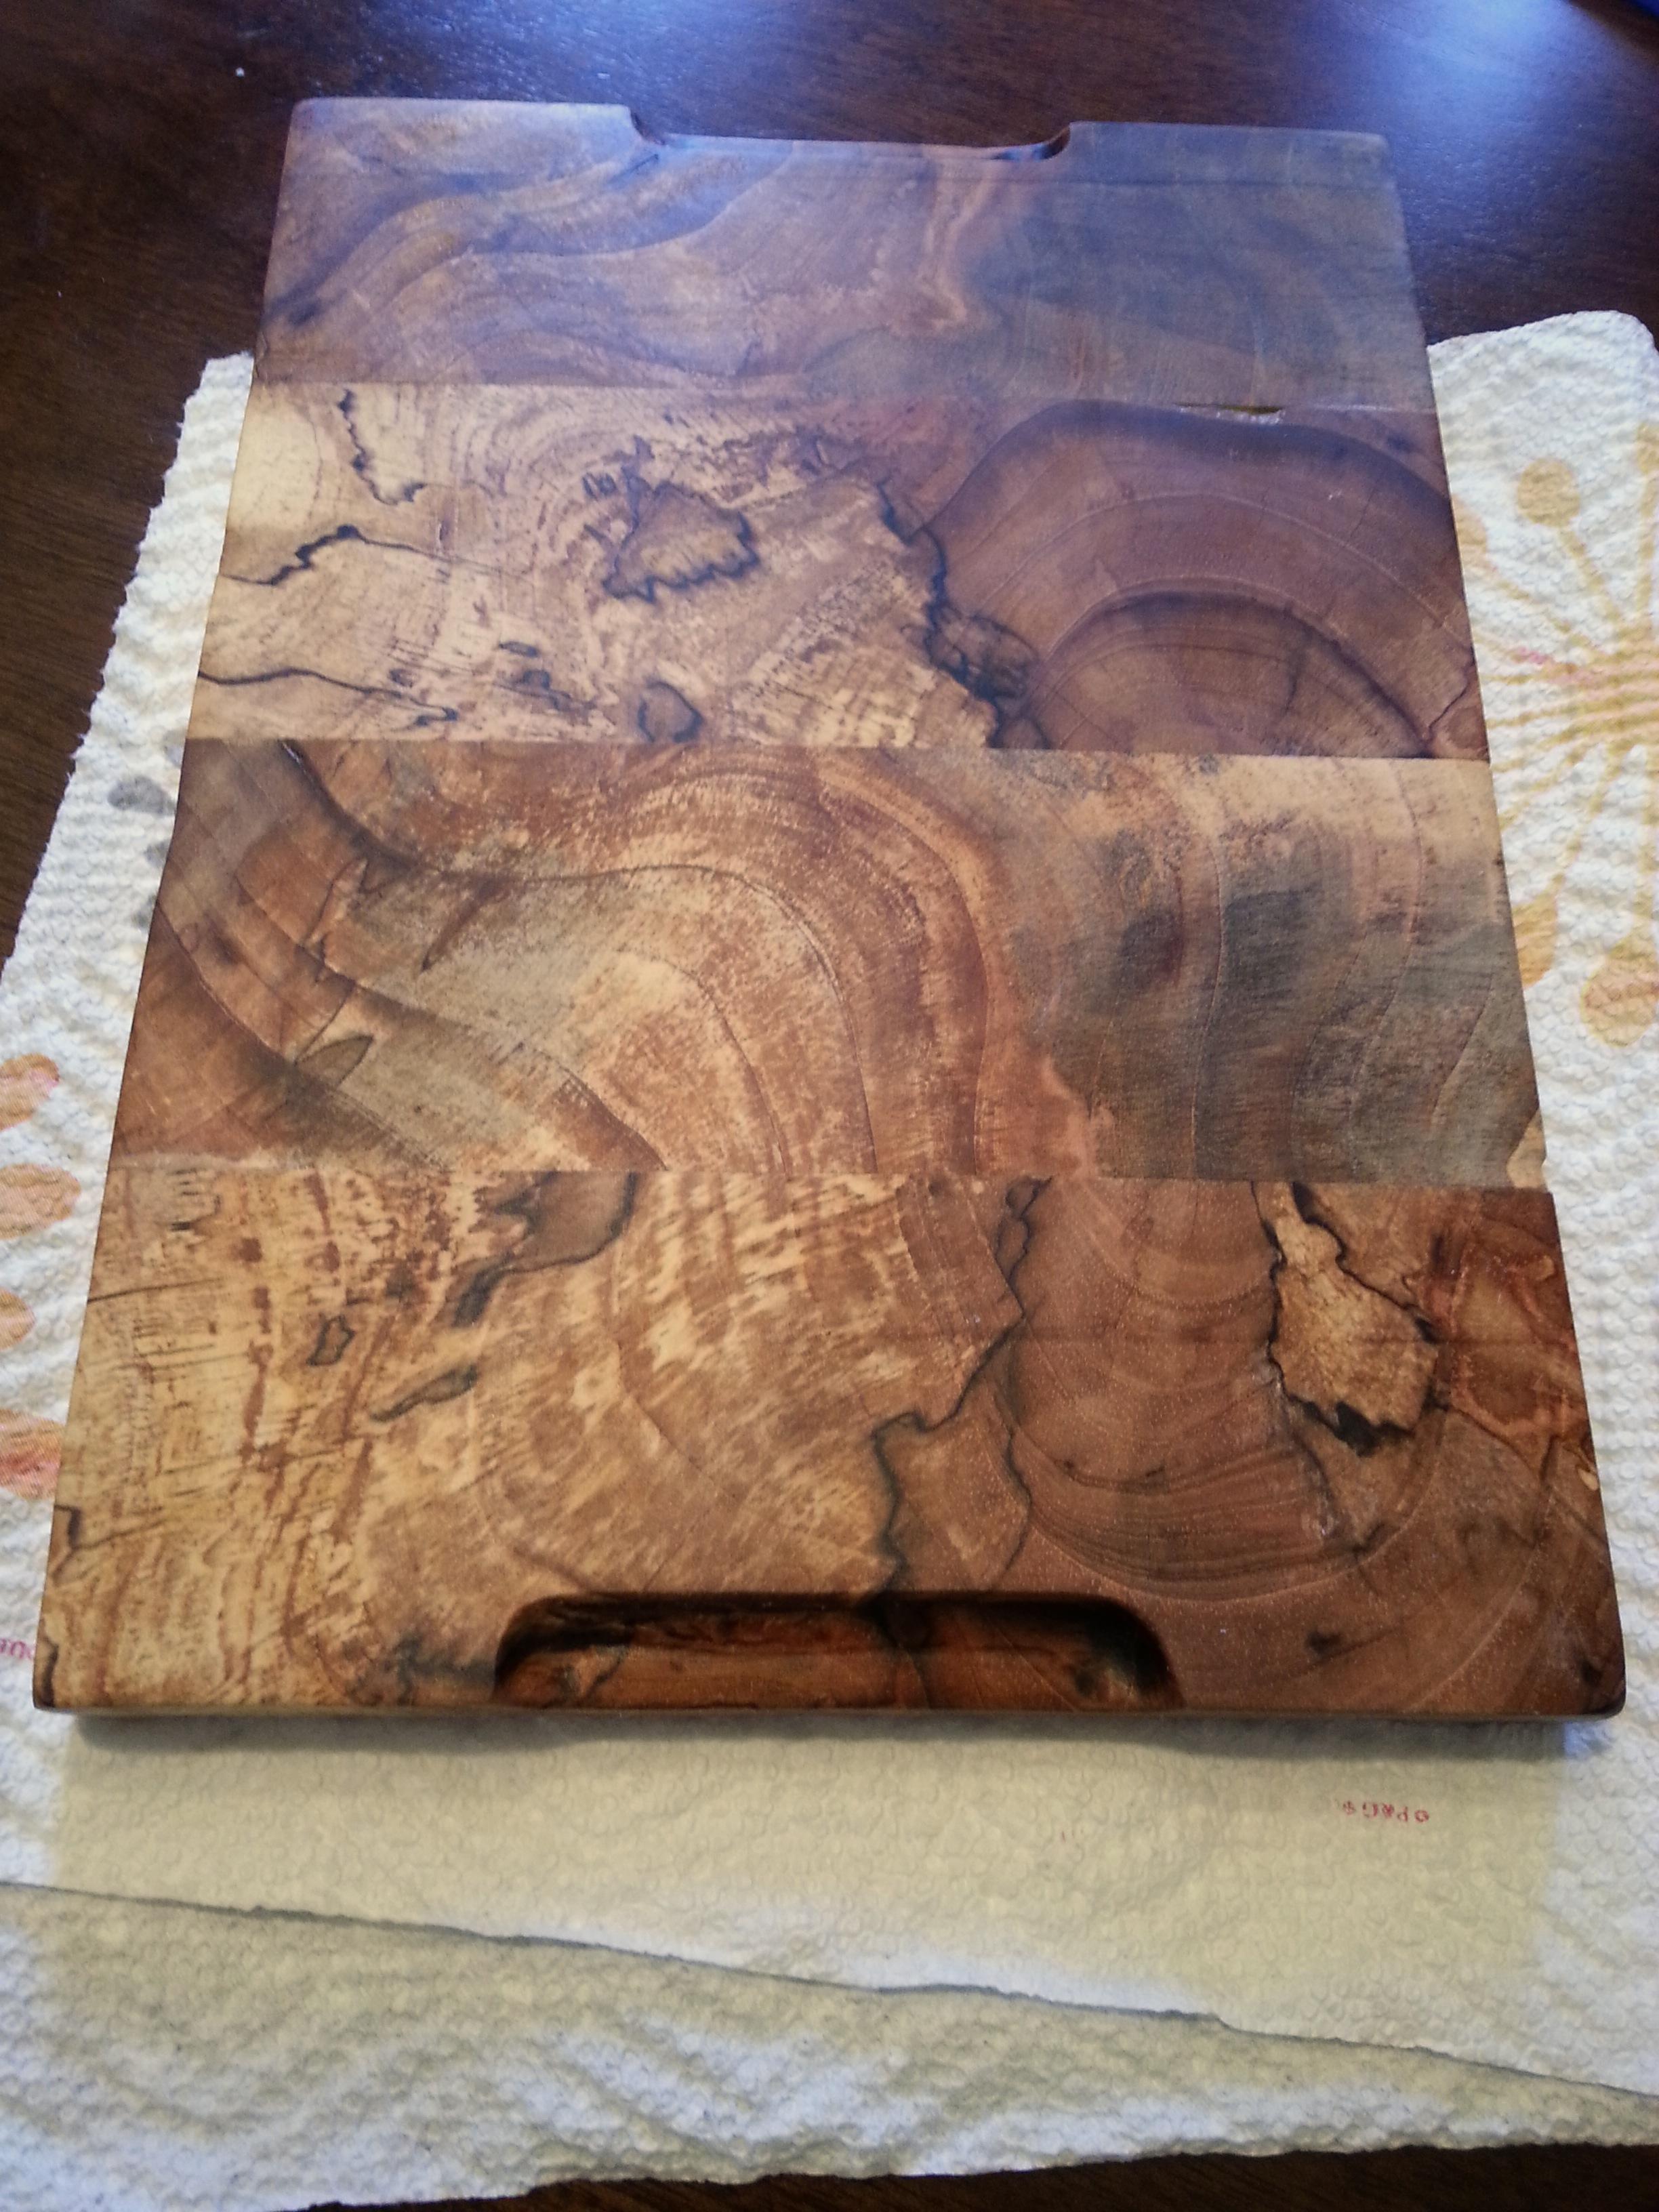 Pecan Wood Cutting Board Things Pat Made